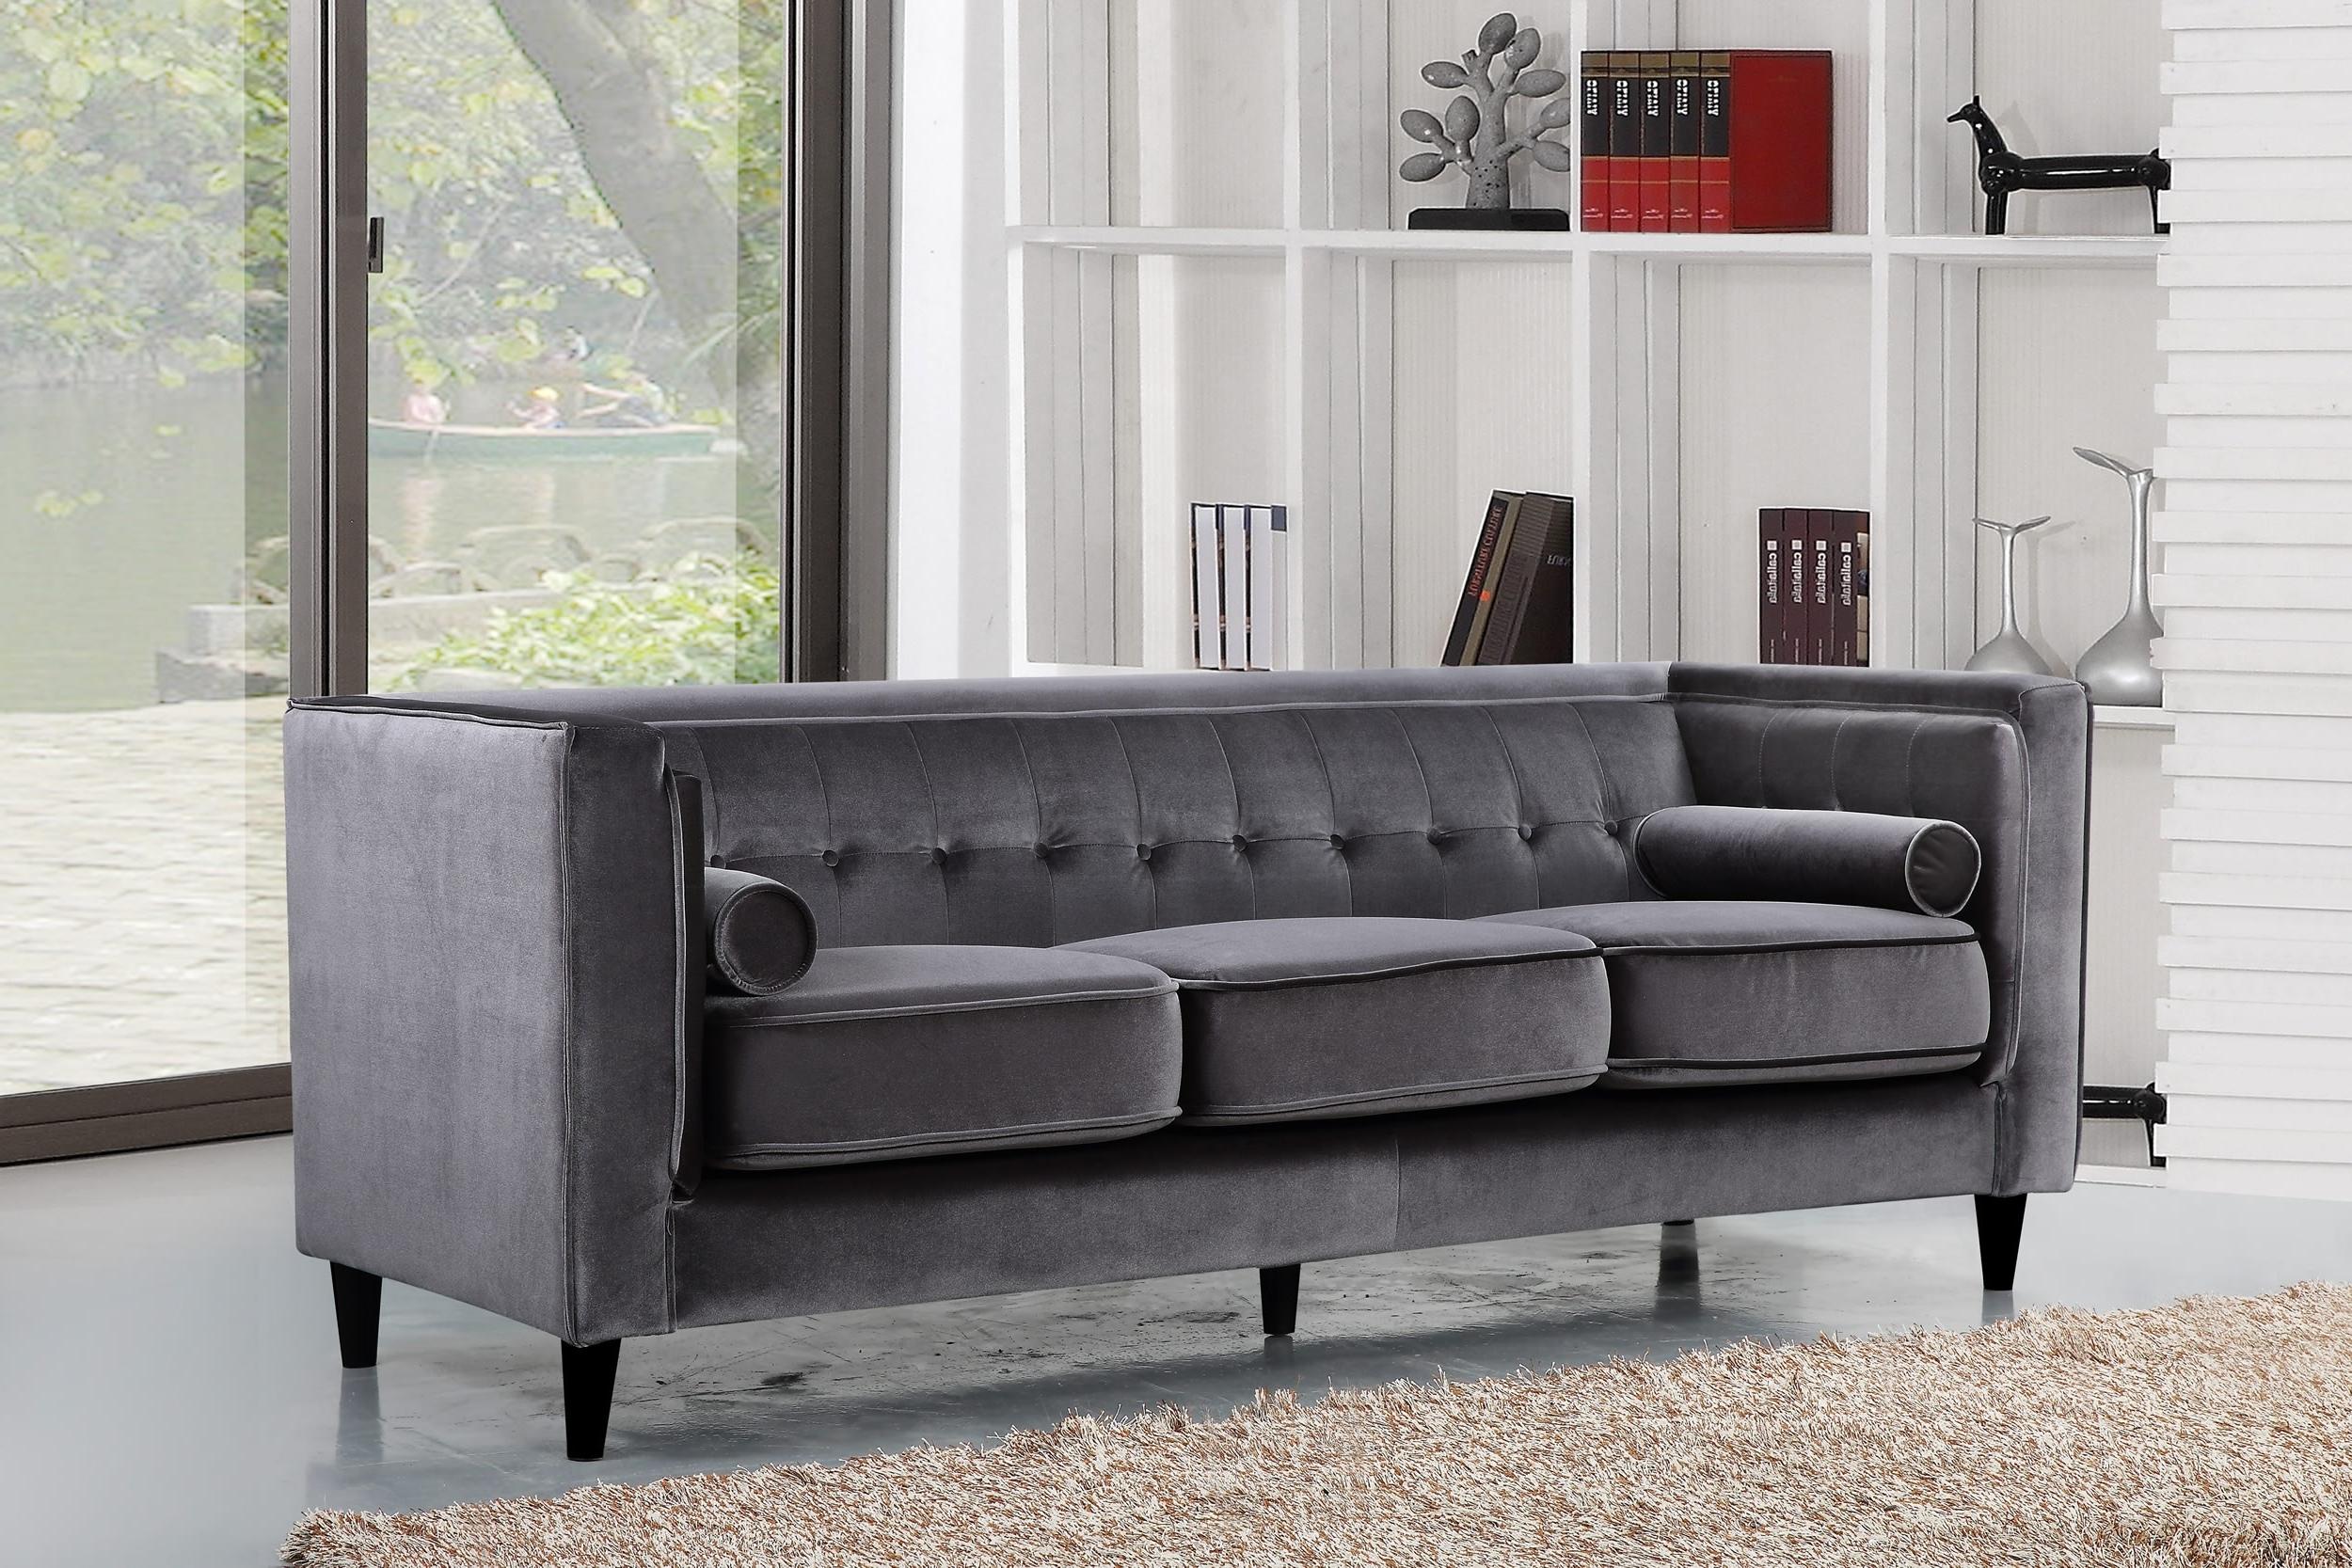 Taylor Velvet Sofa, Grey Buy Online At Best Price – Sohomod Intended For Widely Used Velvet Sofas (View 11 of 20)